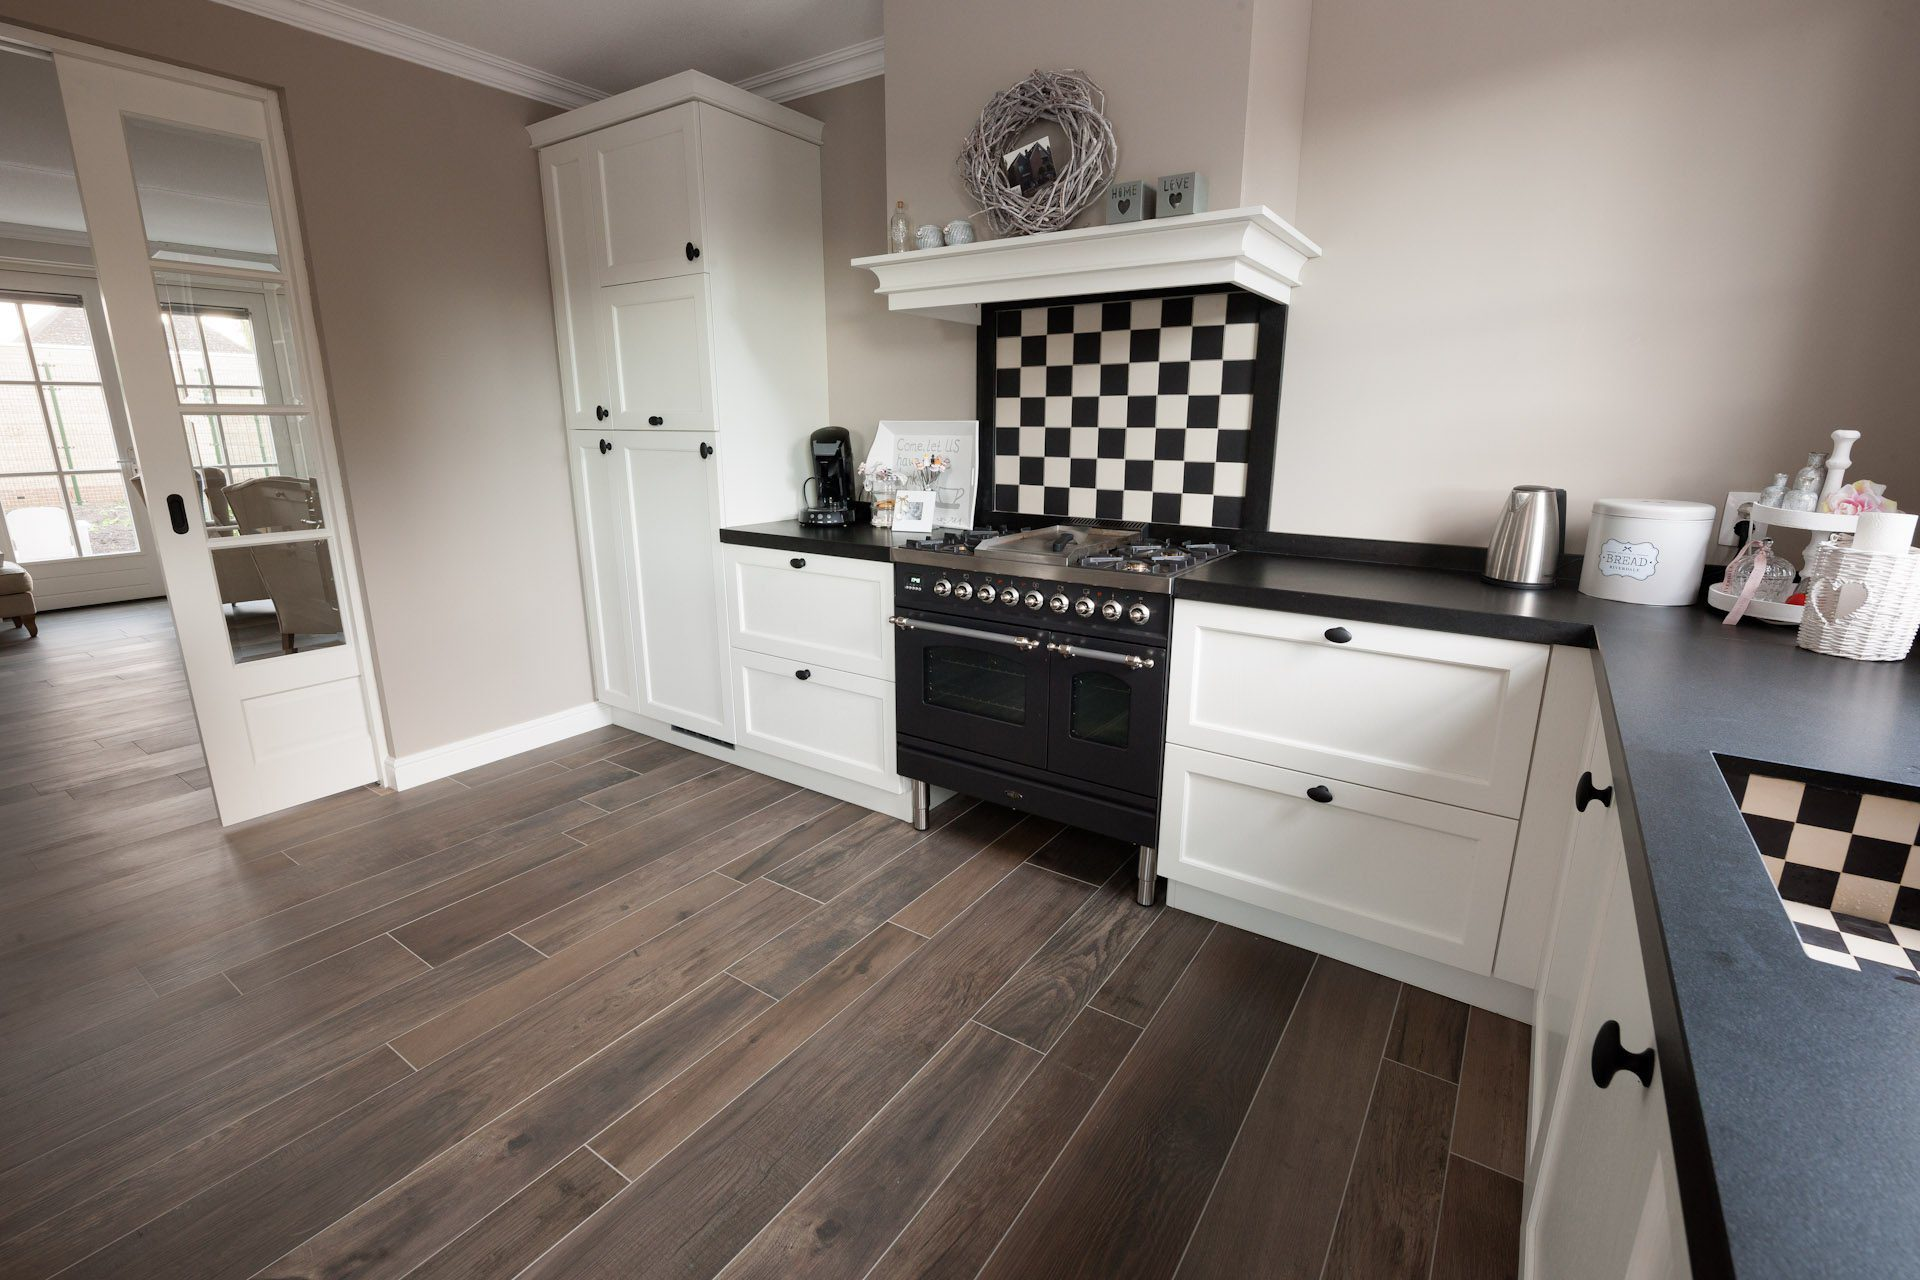 Houtlook tegels in woonkamer zwart wit geblokte vloer in hal - Kiezen tegelvloer ...